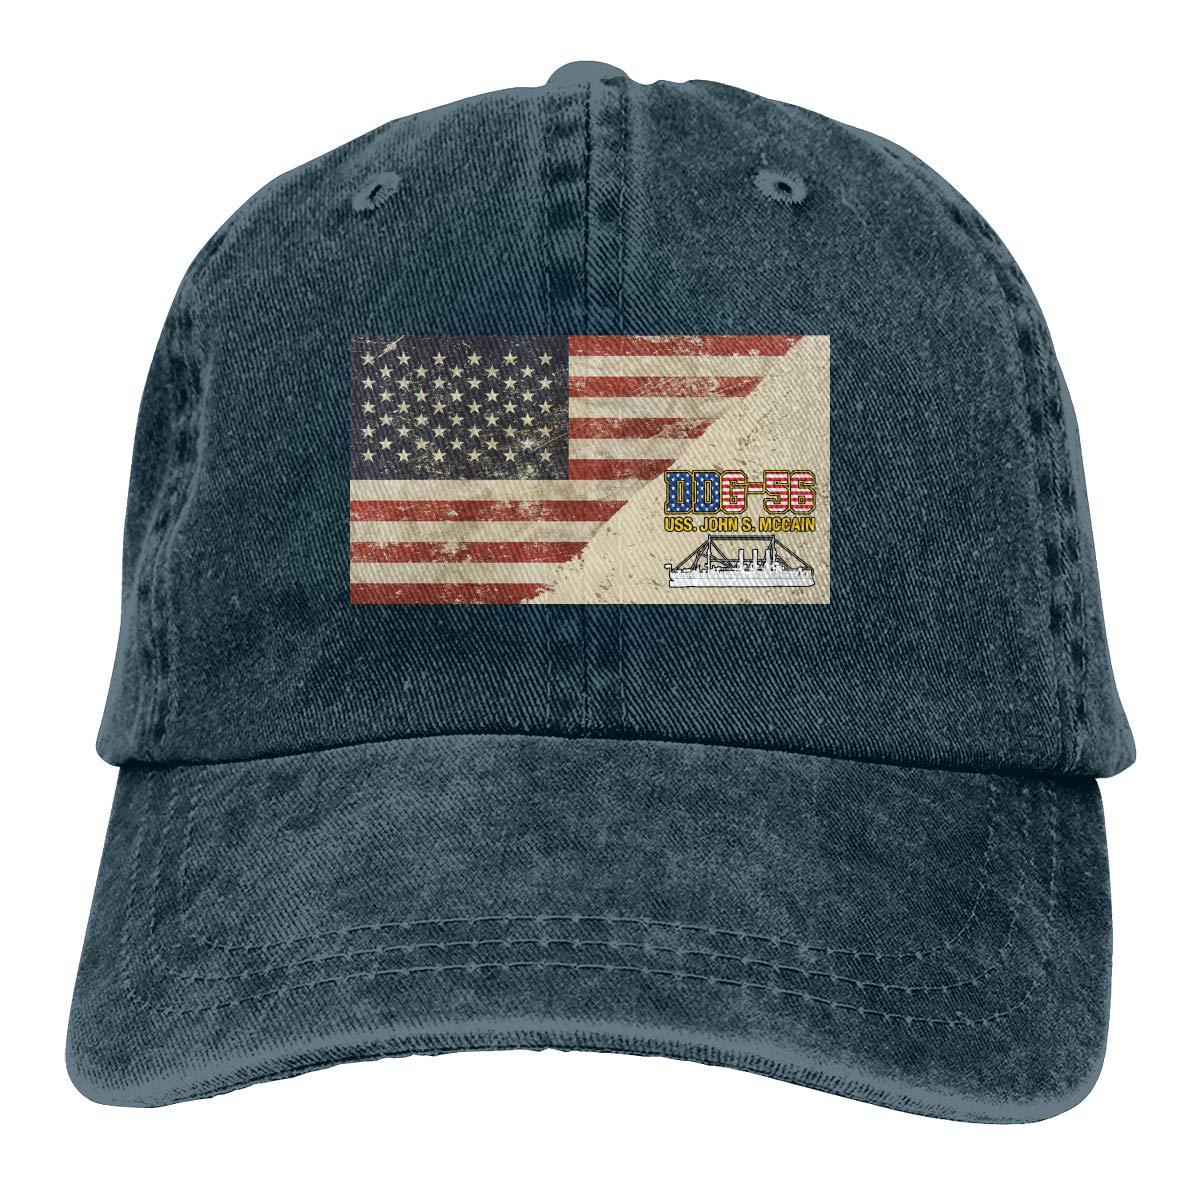 DDG-56 uss john s mccain denim chapéus boné de beisebol ajustável pai chapéus